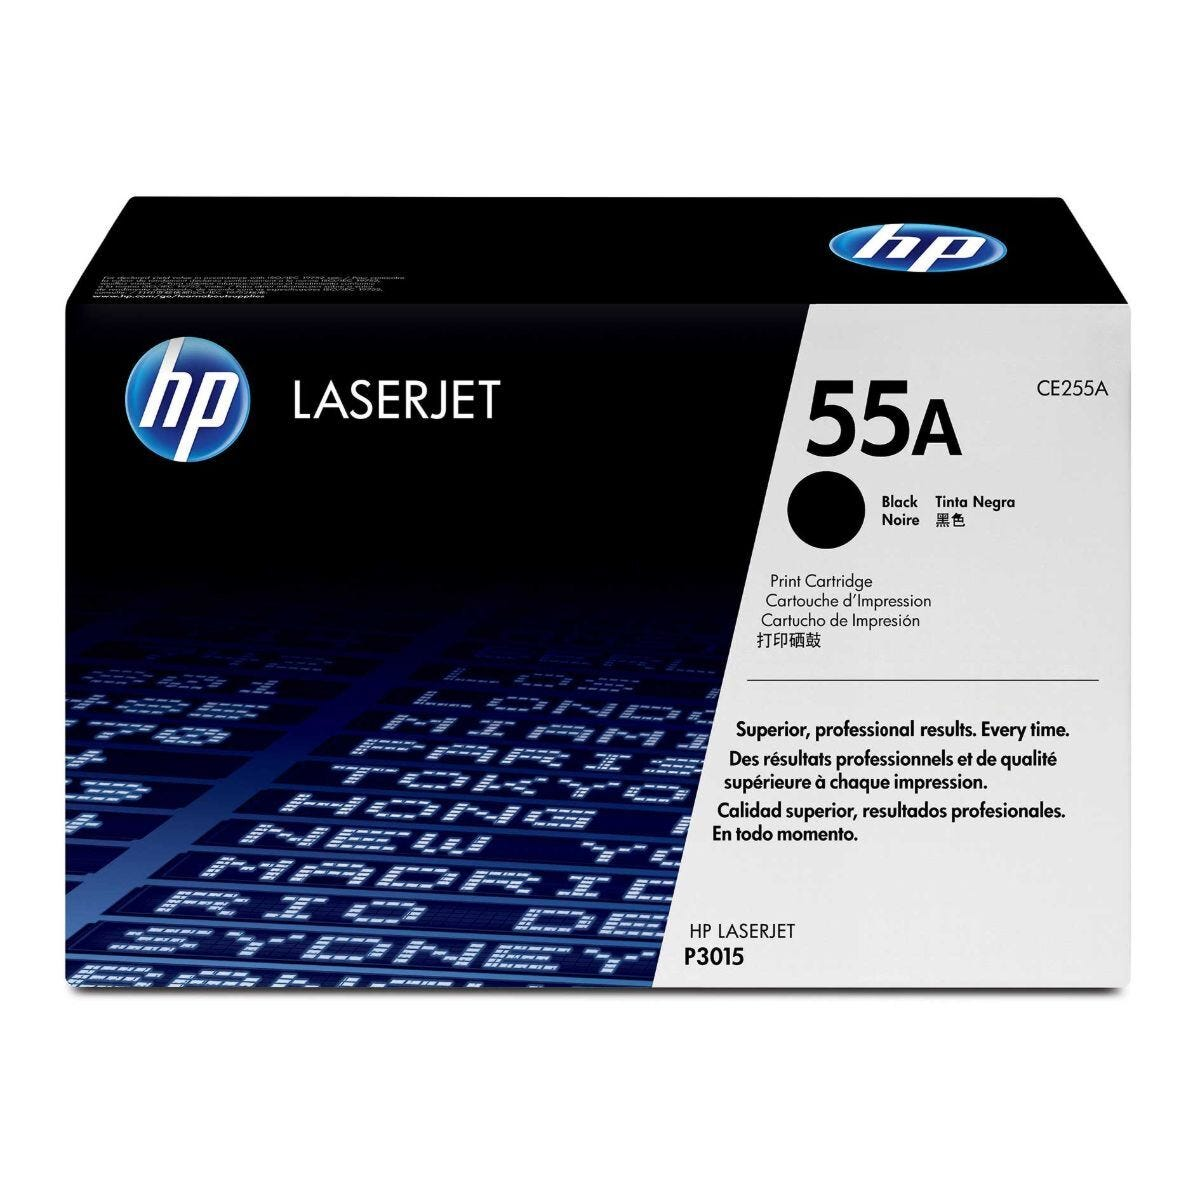 HP 55A Laserjet Printer Ink Toner Cartridge CE255A